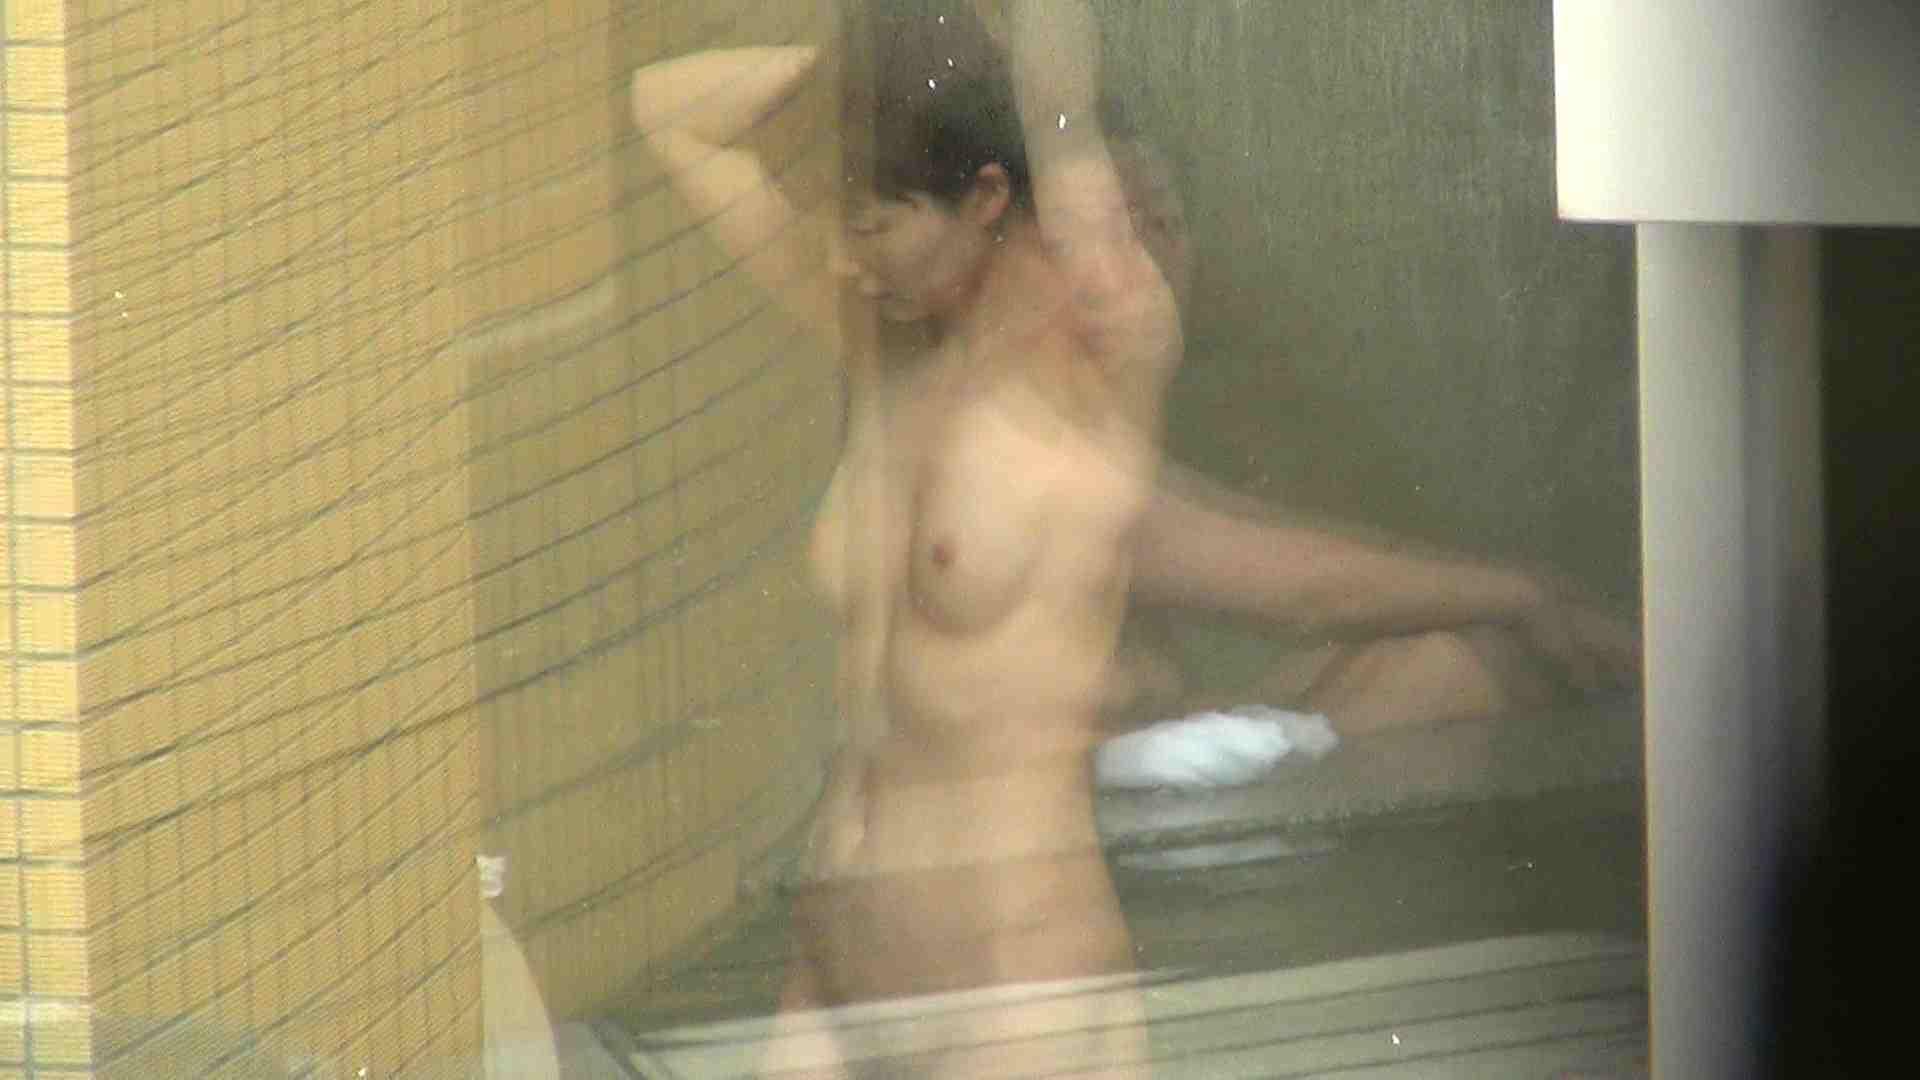 Aquaな露天風呂Vol.299 HなOL | 露天  80pic 44